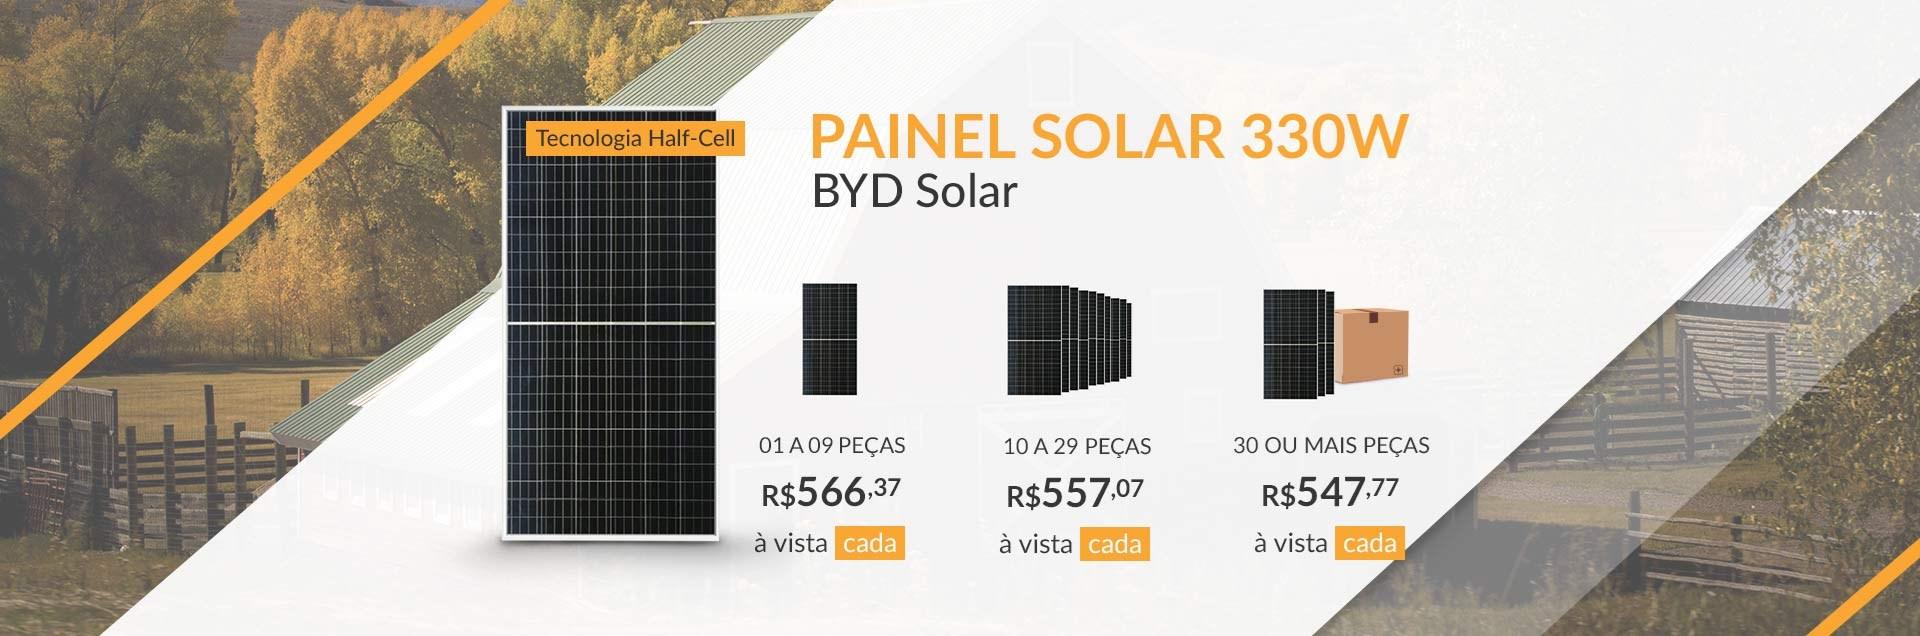 Painel Solar 330W BYD Solar - Junho